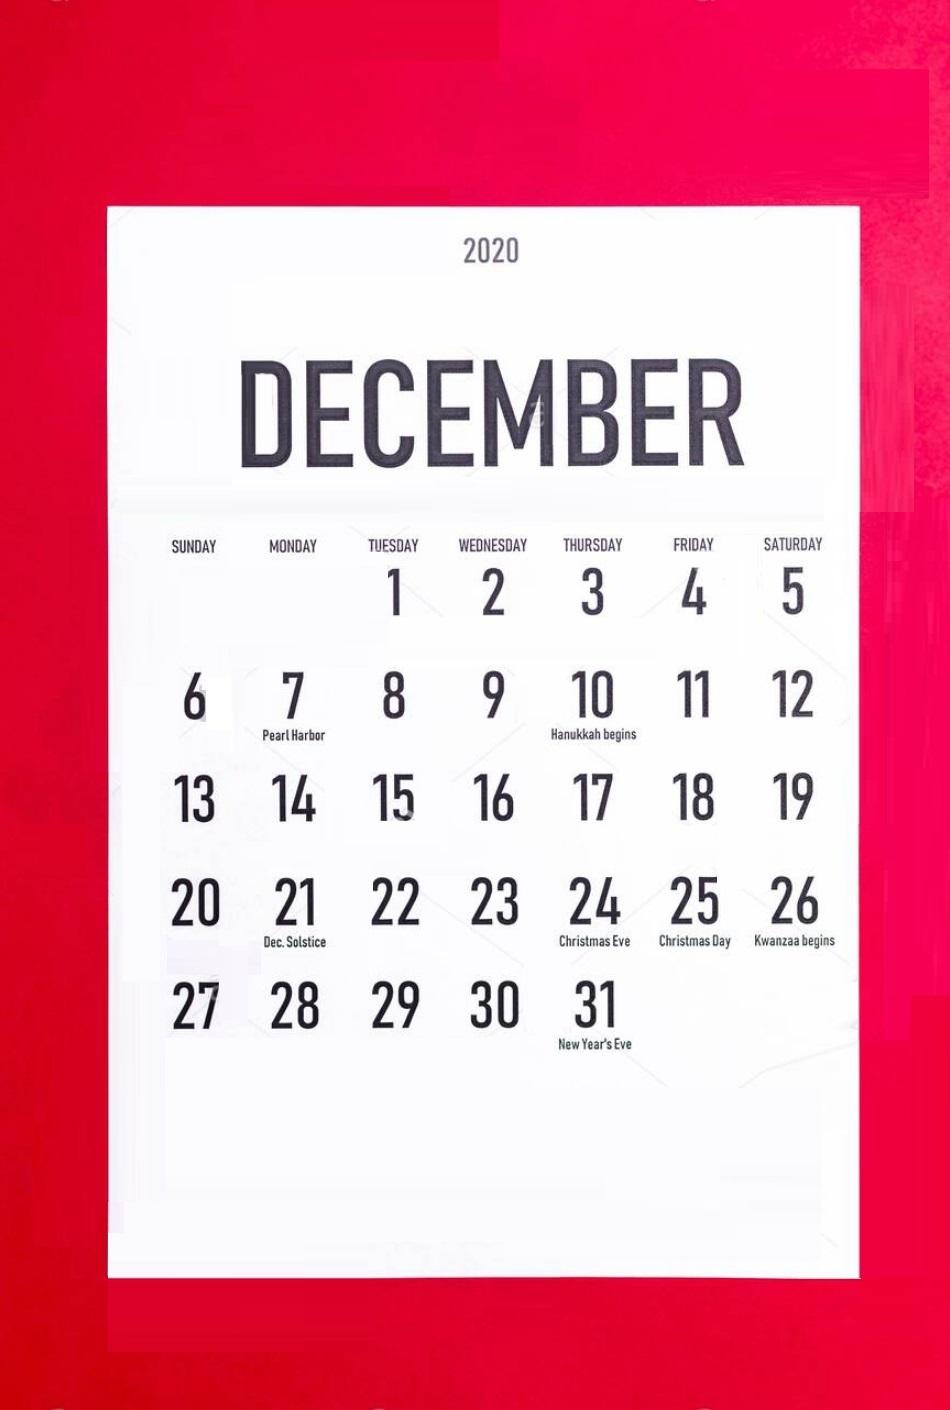 December 2020 Holidays Calendar Design